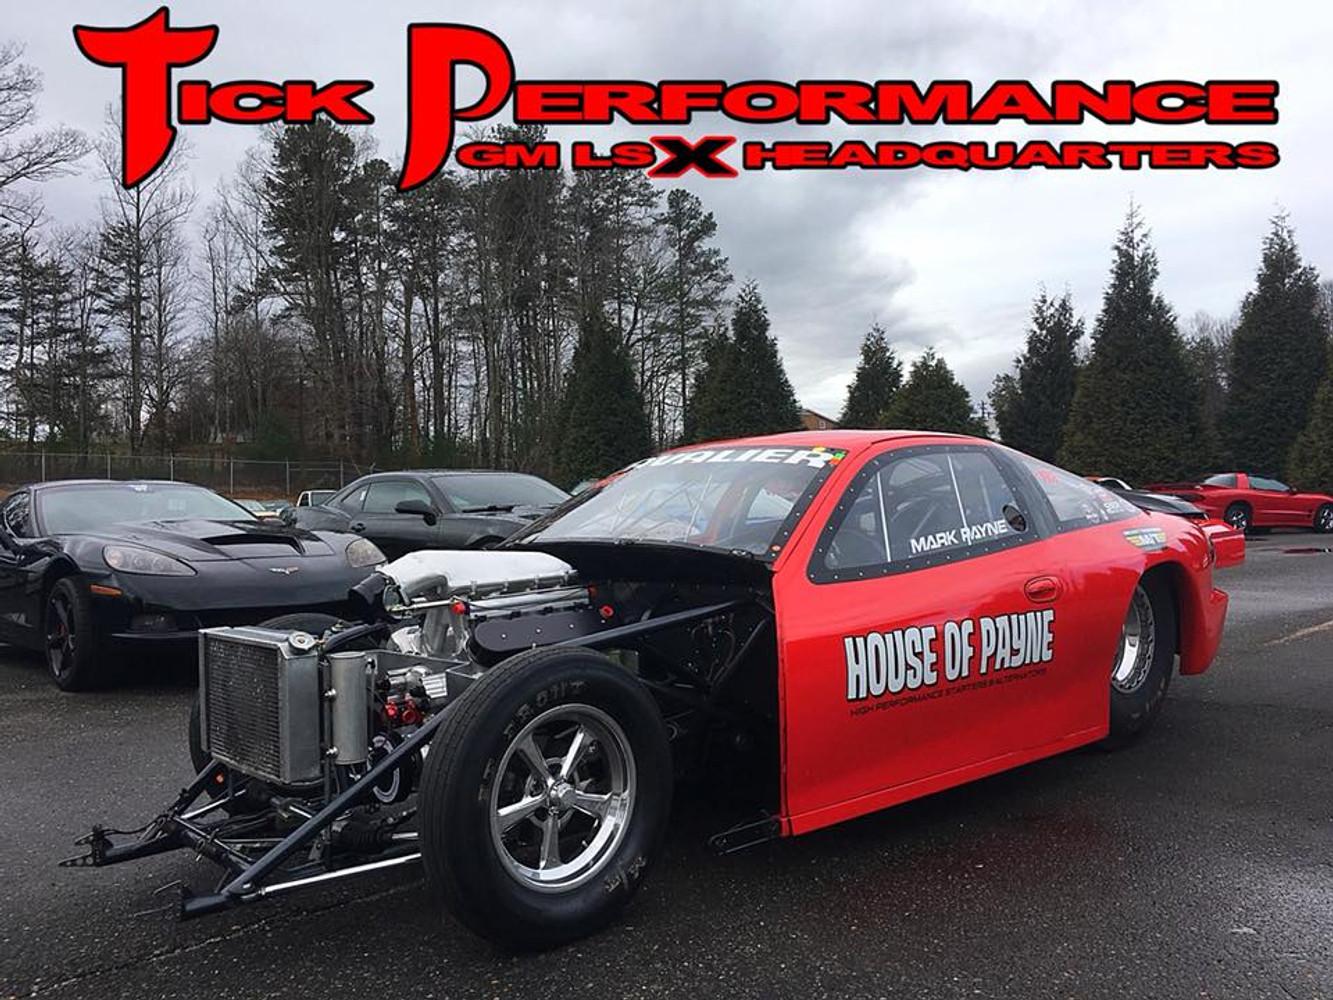 Mark Payne's Twin Turbo Top Sportsman Cavalier Build